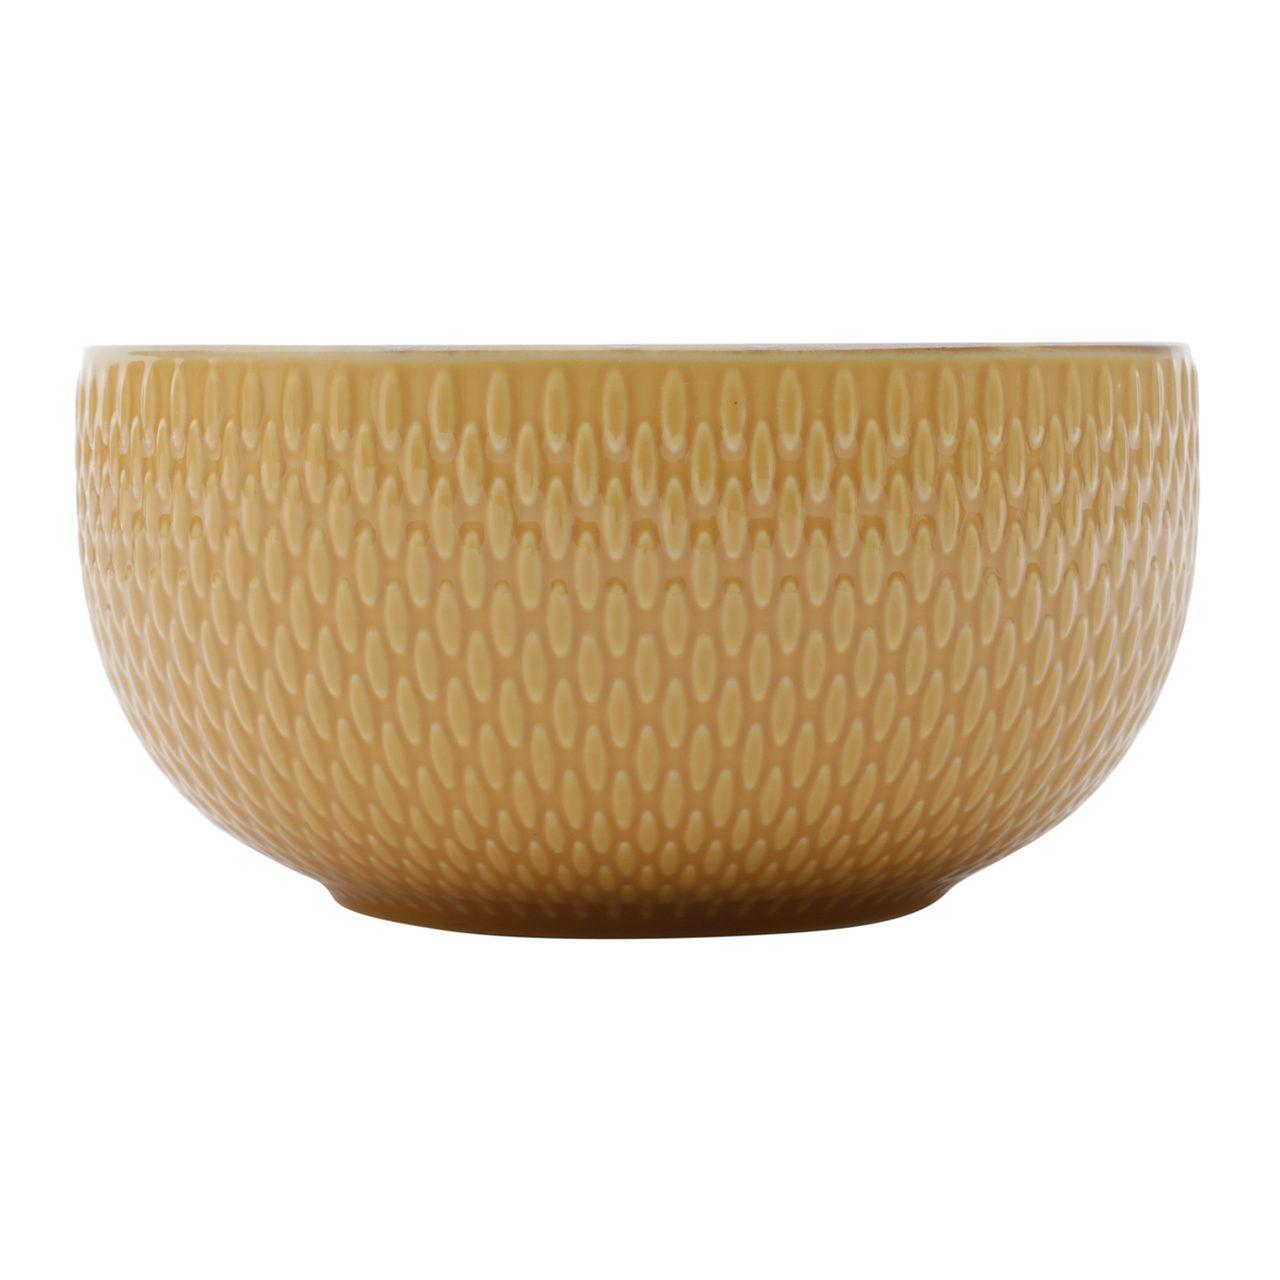 Jg 02 Bowls Amarelo de Porcelana 700ml